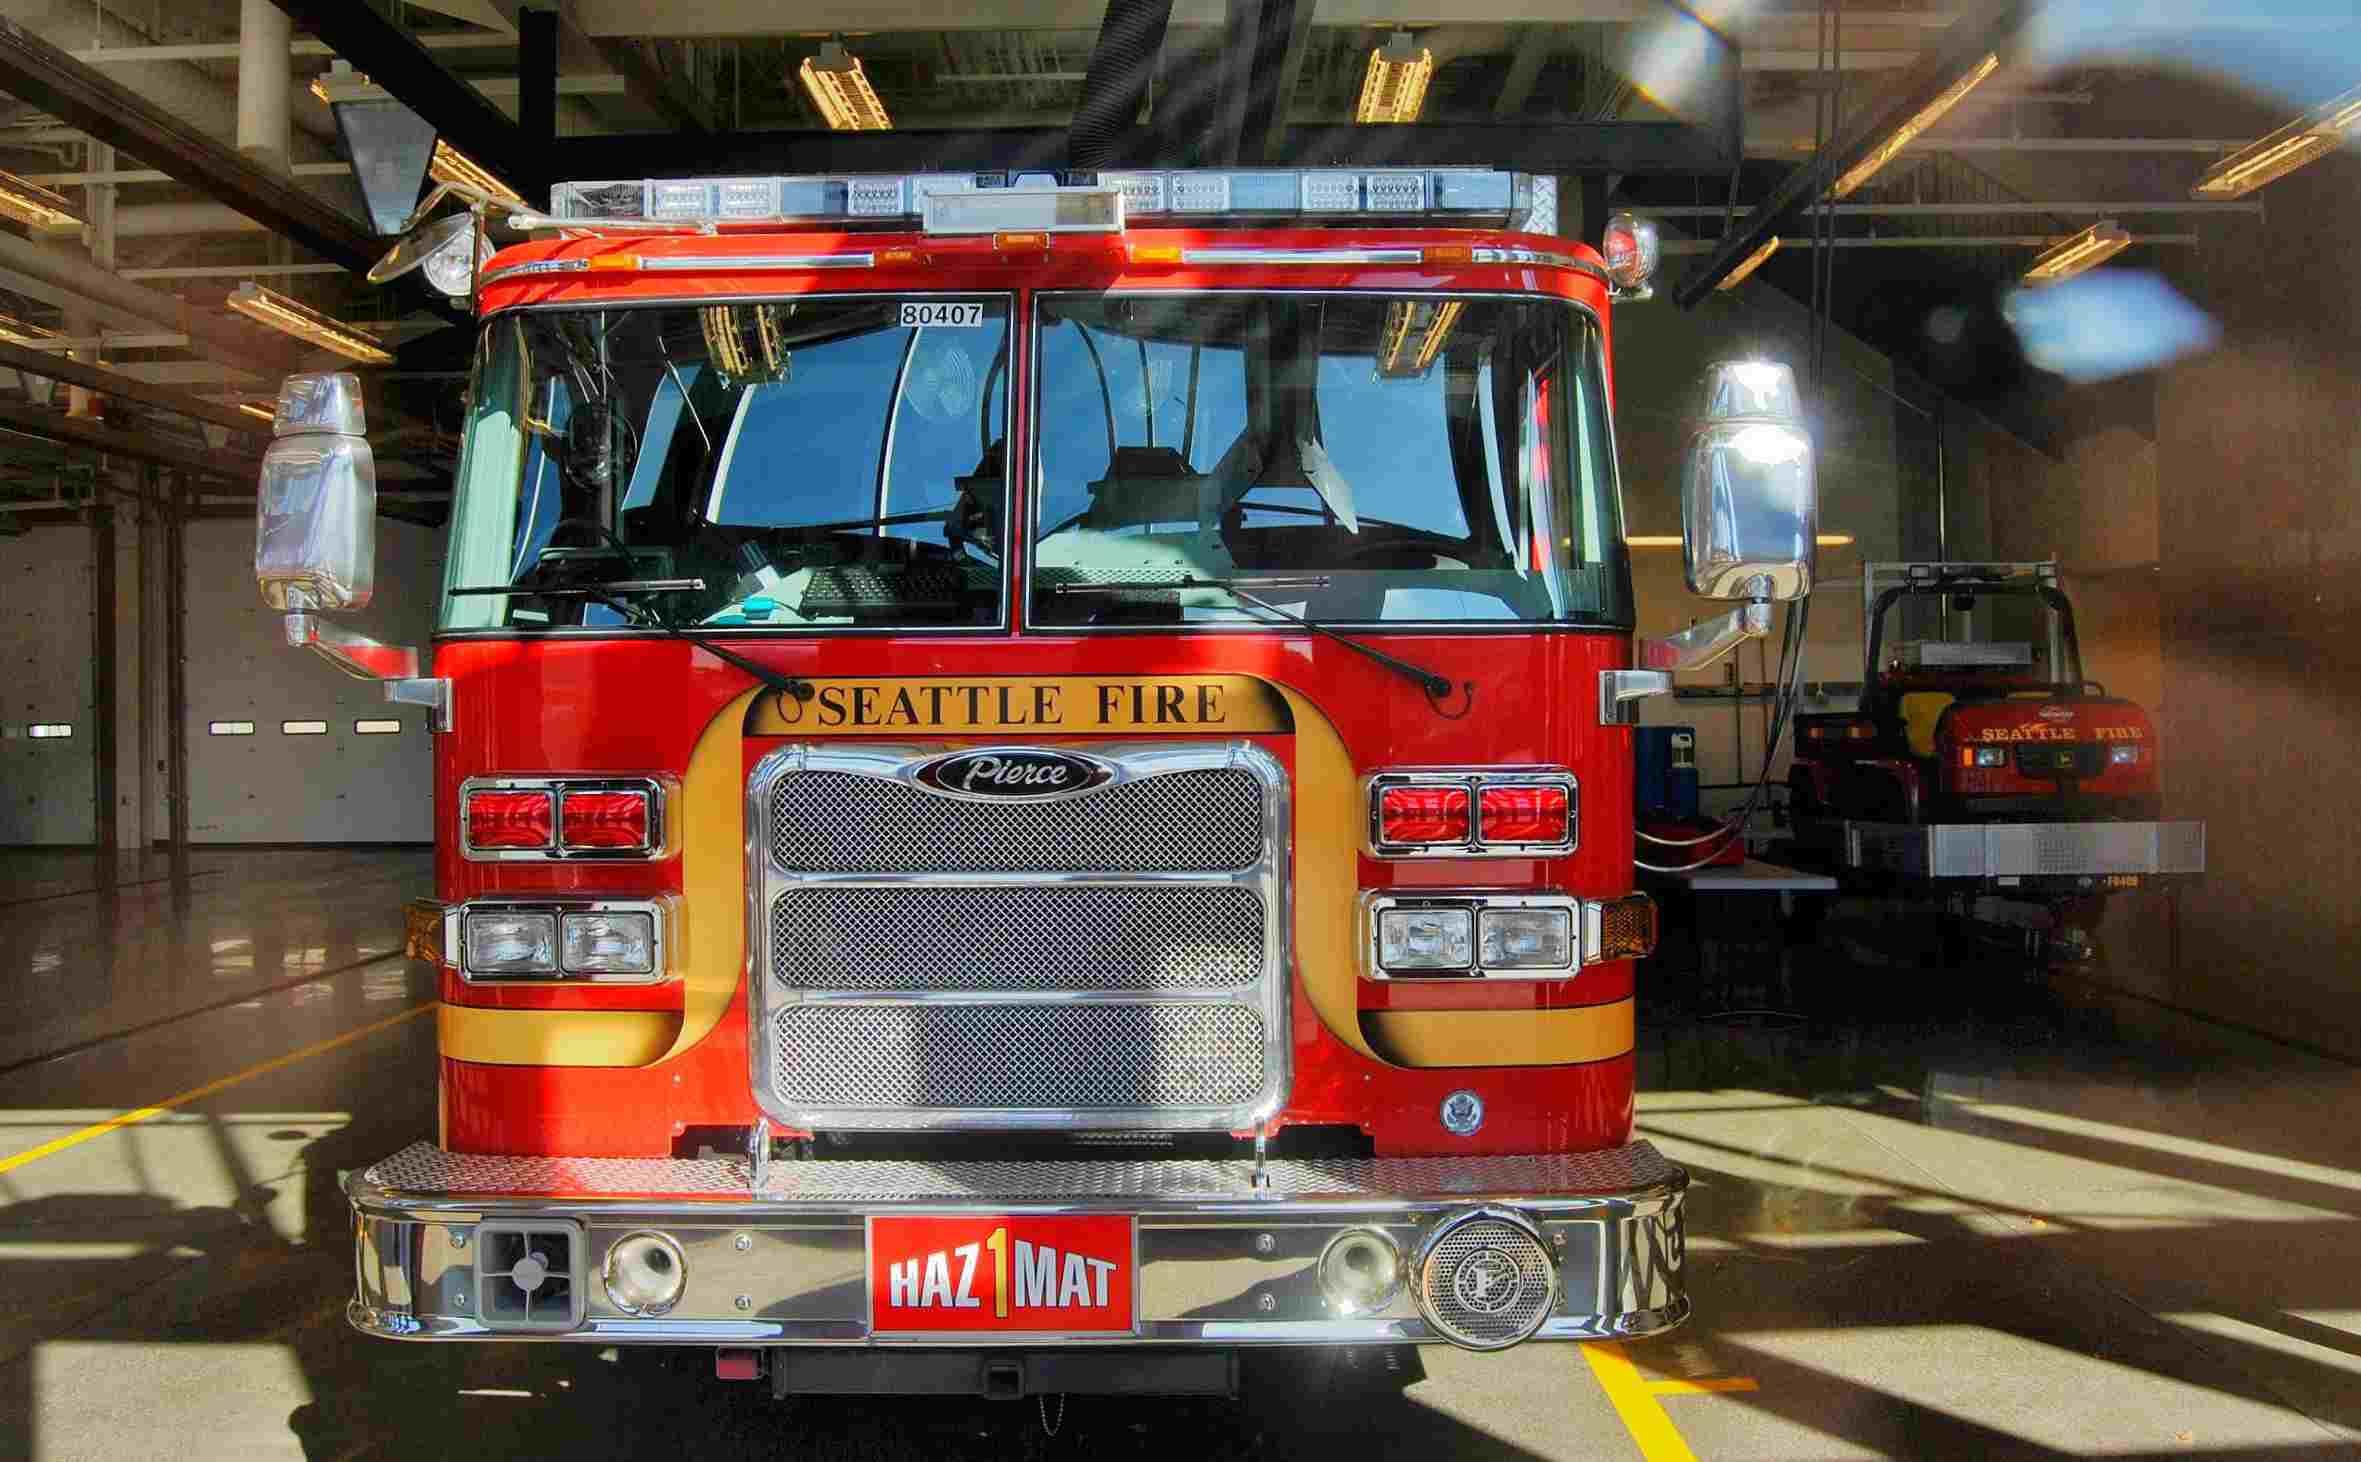 Firetruck at Last Resort Fire Department in Seattle